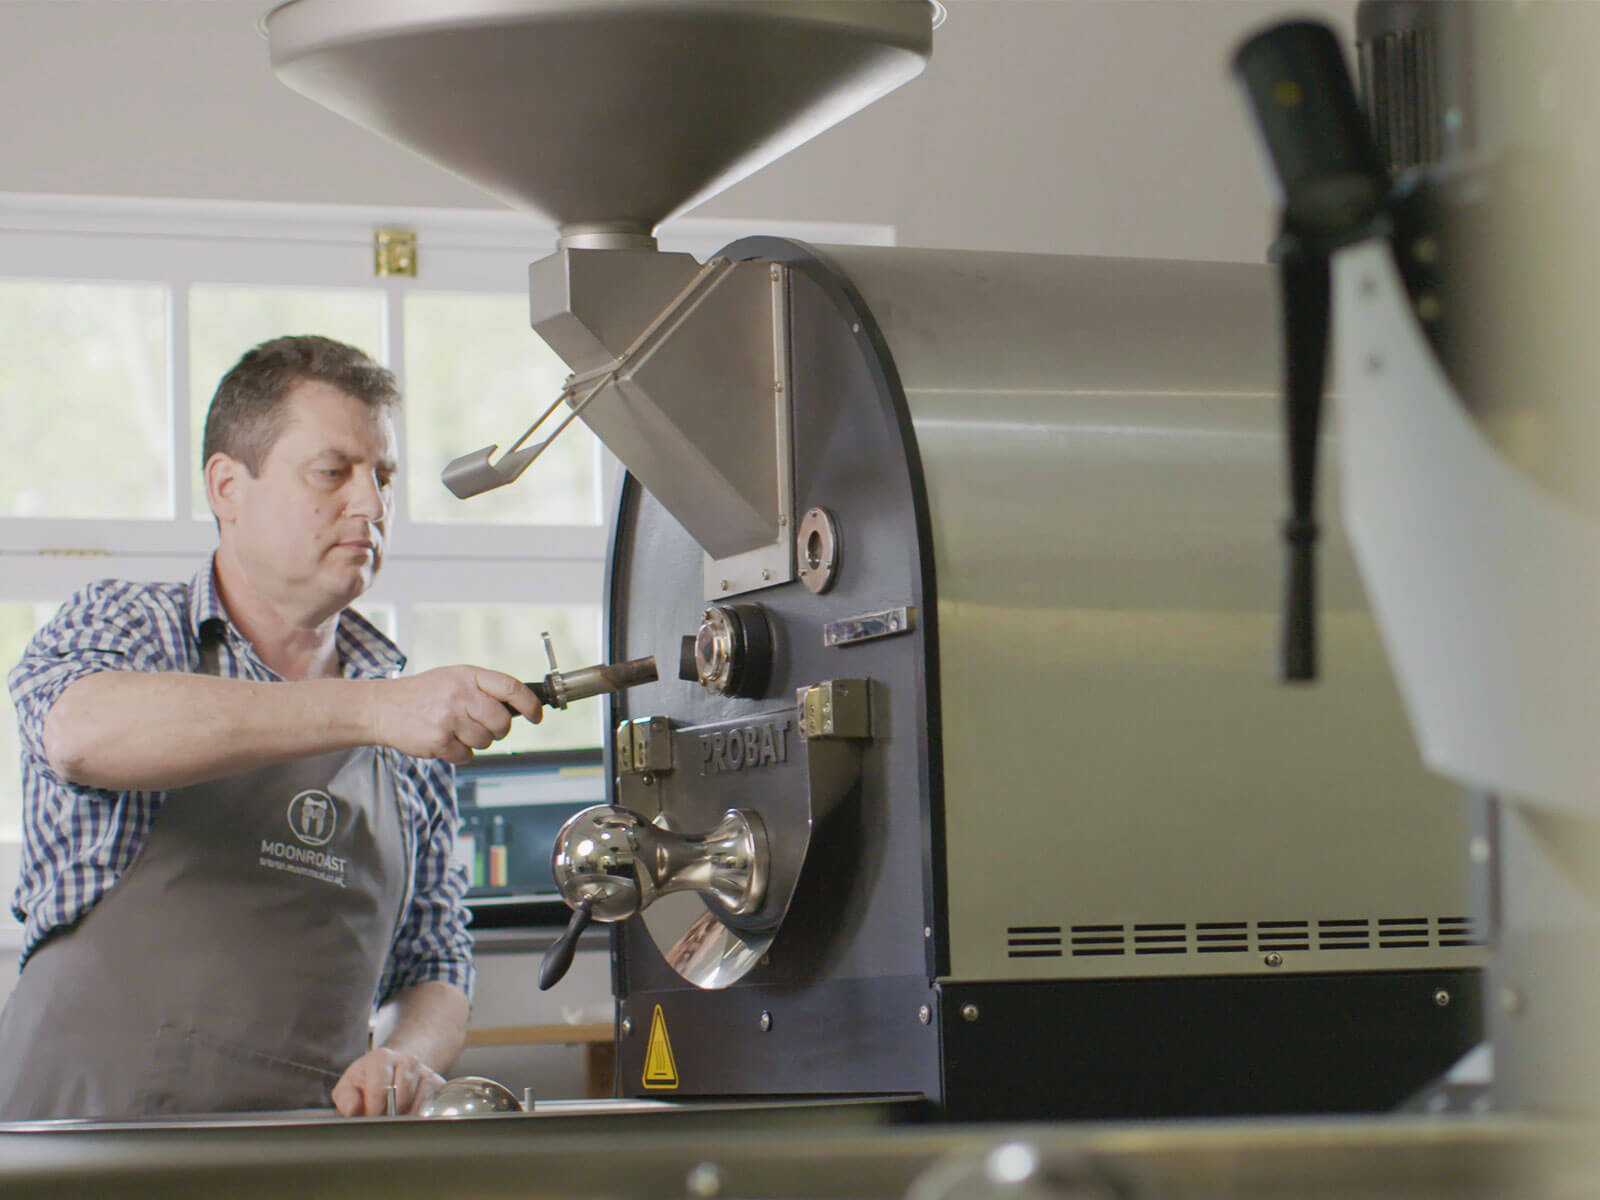 Fran roasting coffee beans